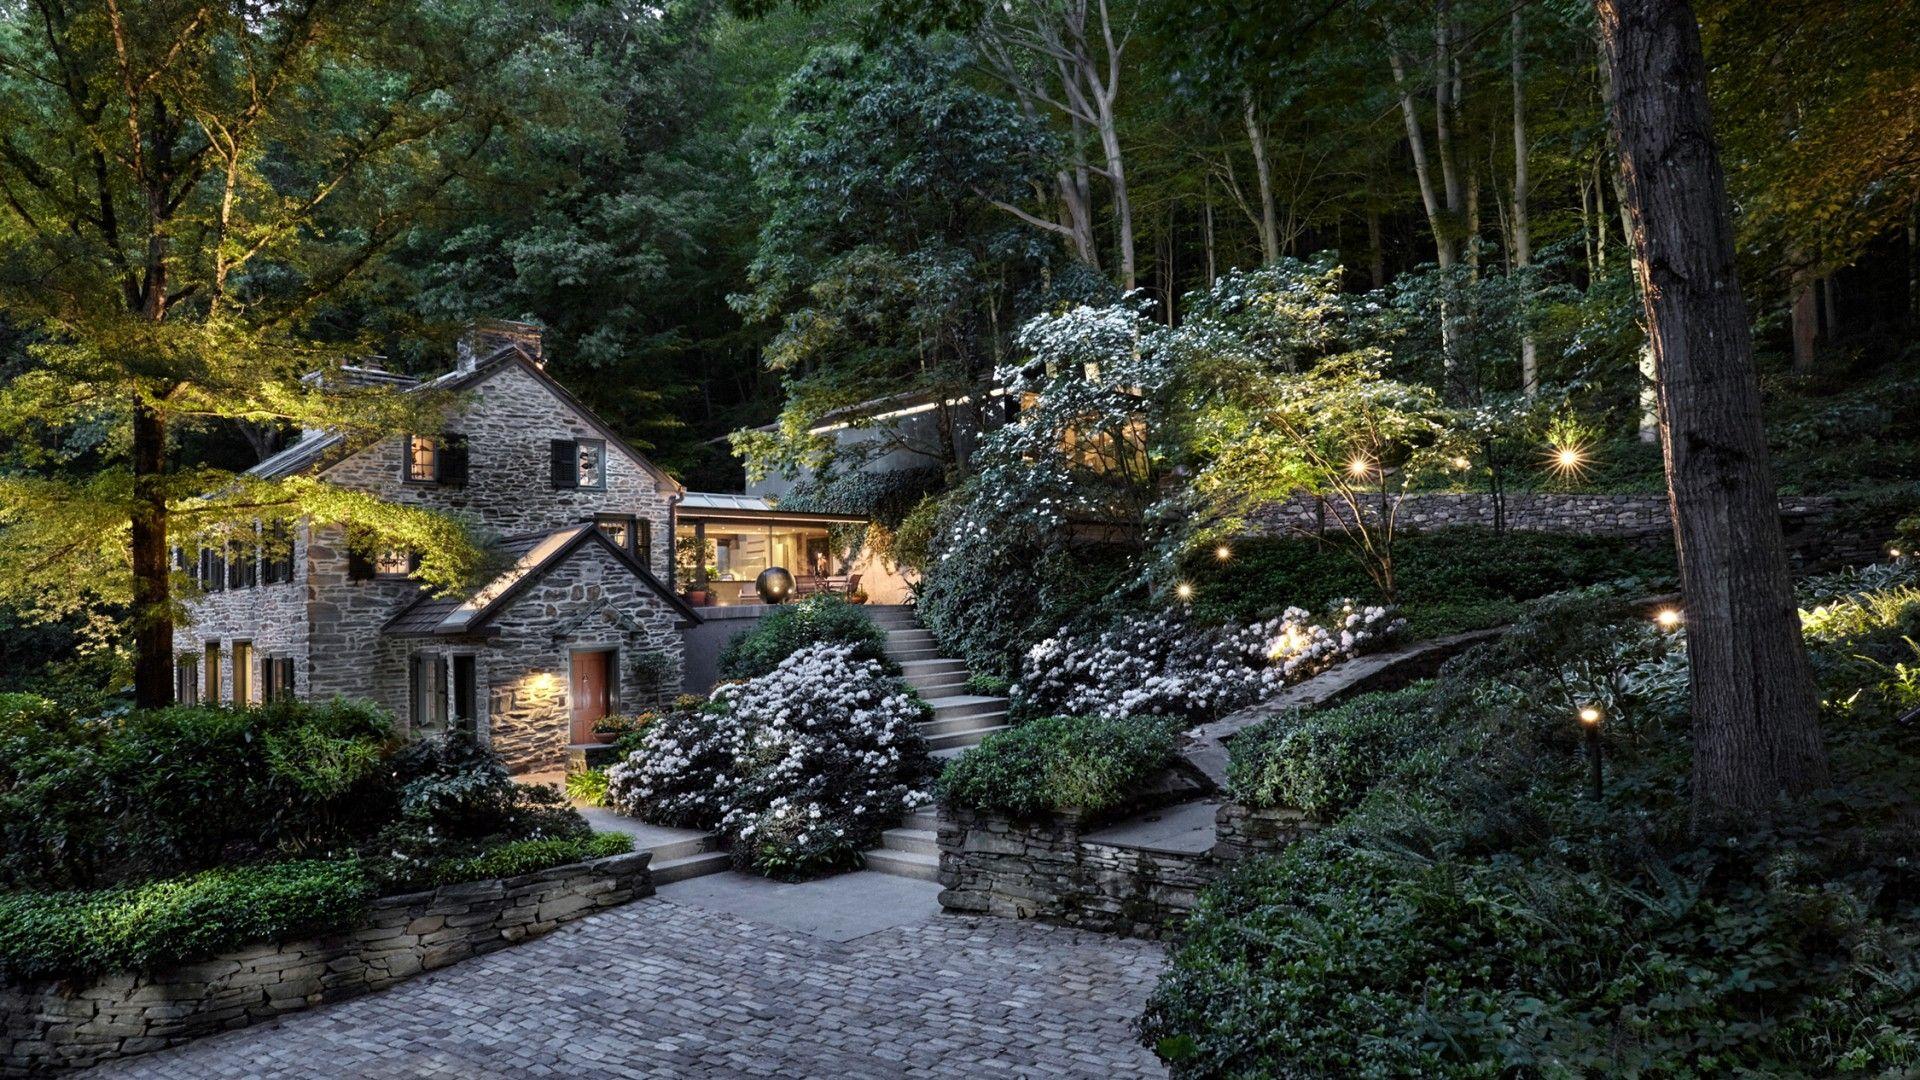 nature landscape trees house england uk cottage forest